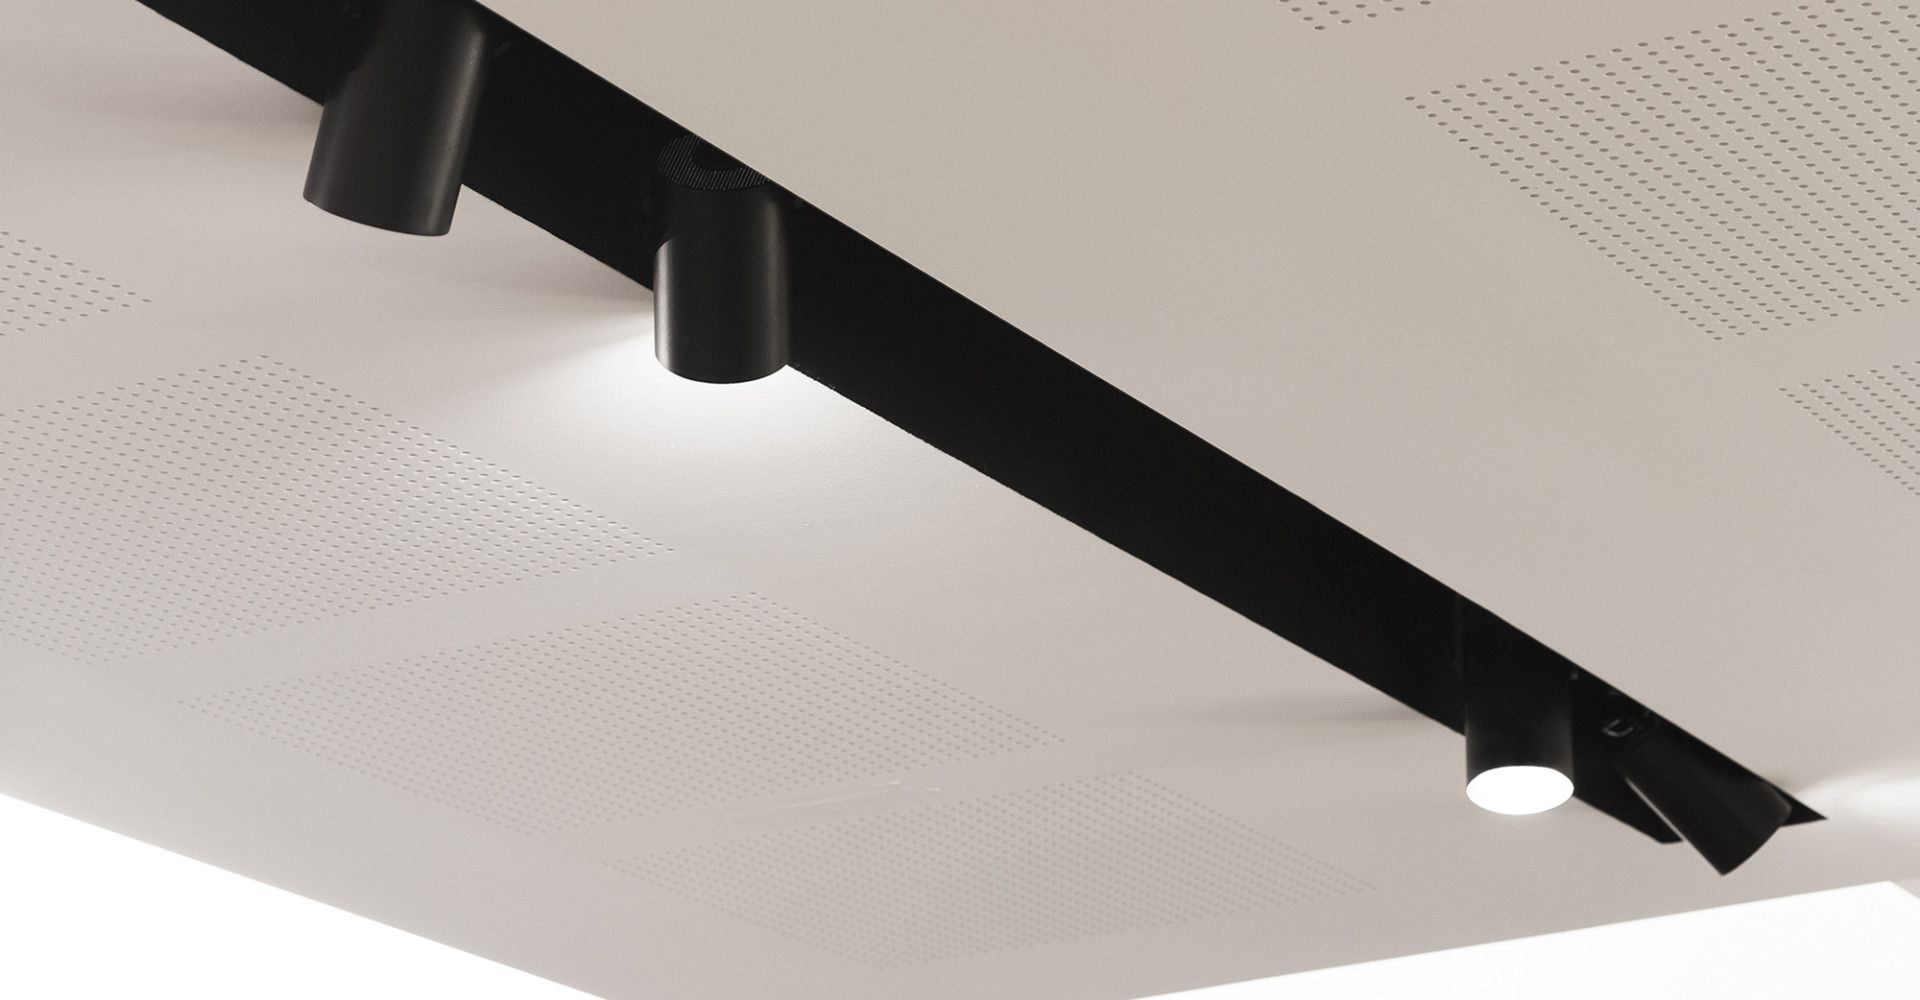 Recessed Track Light Google Kereses Track Lighting Light Recess